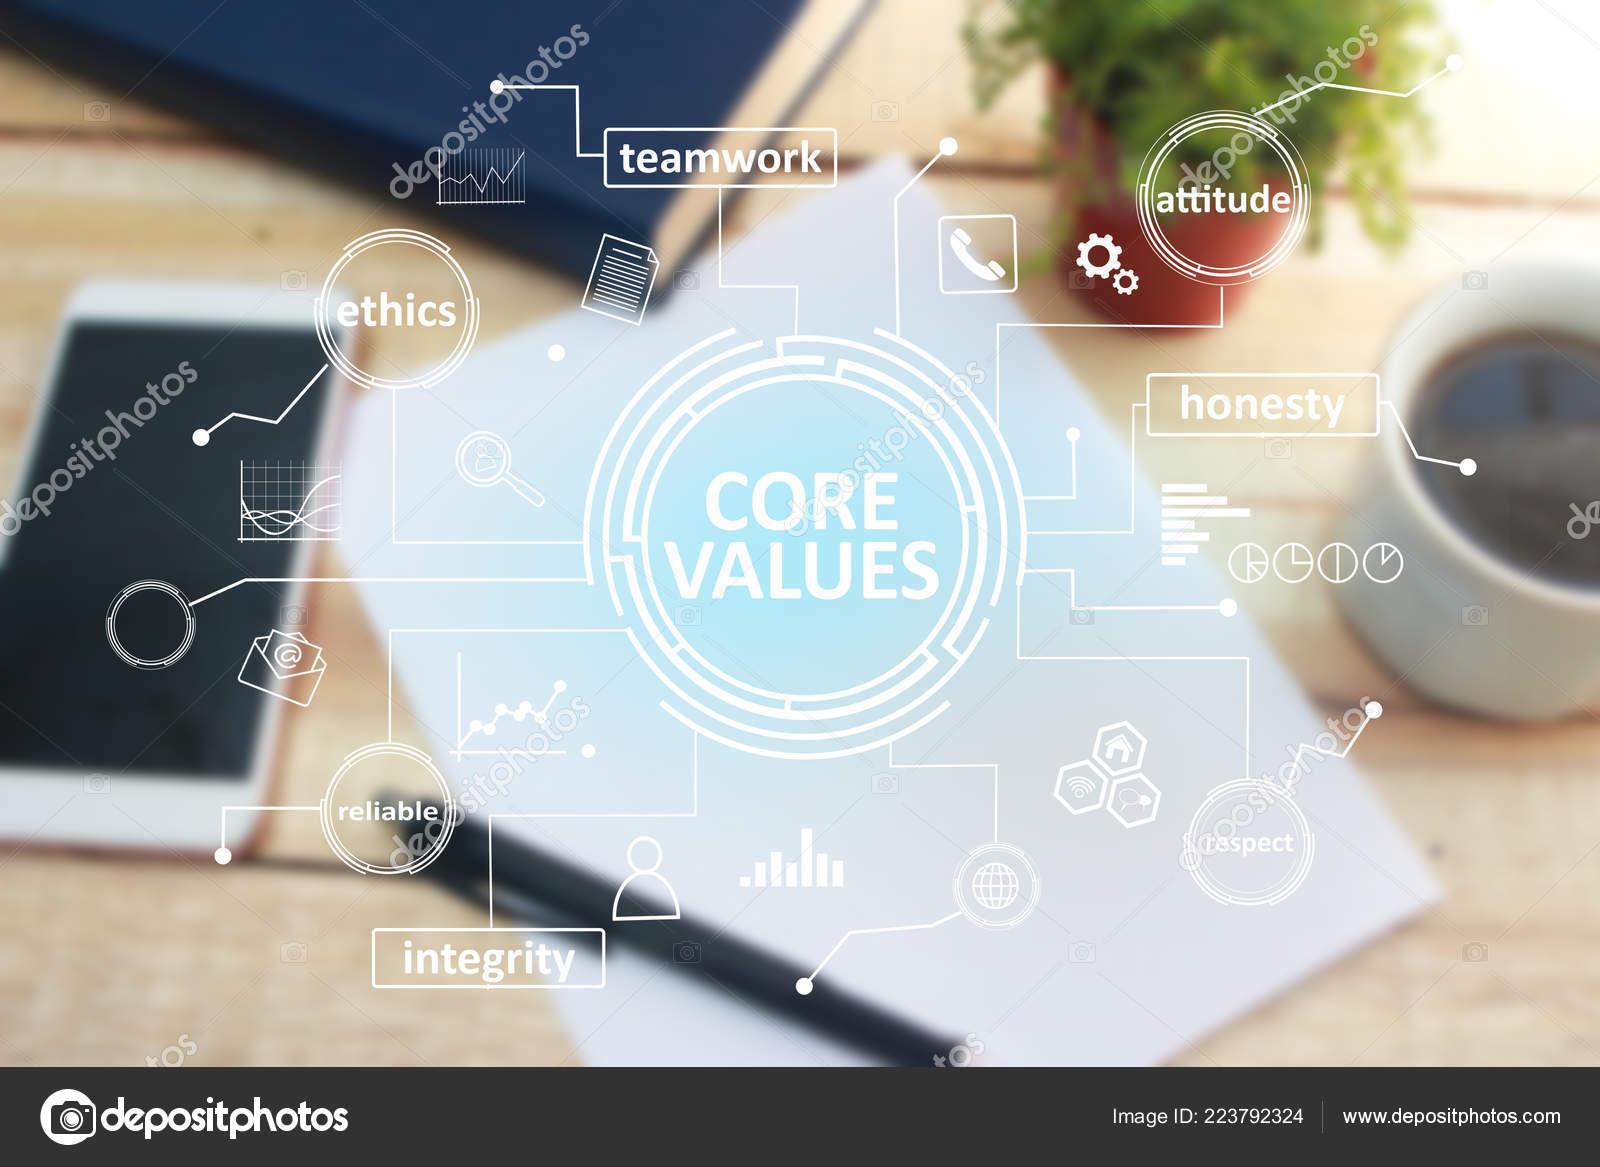 core values business ethics motivational inspirational quotes